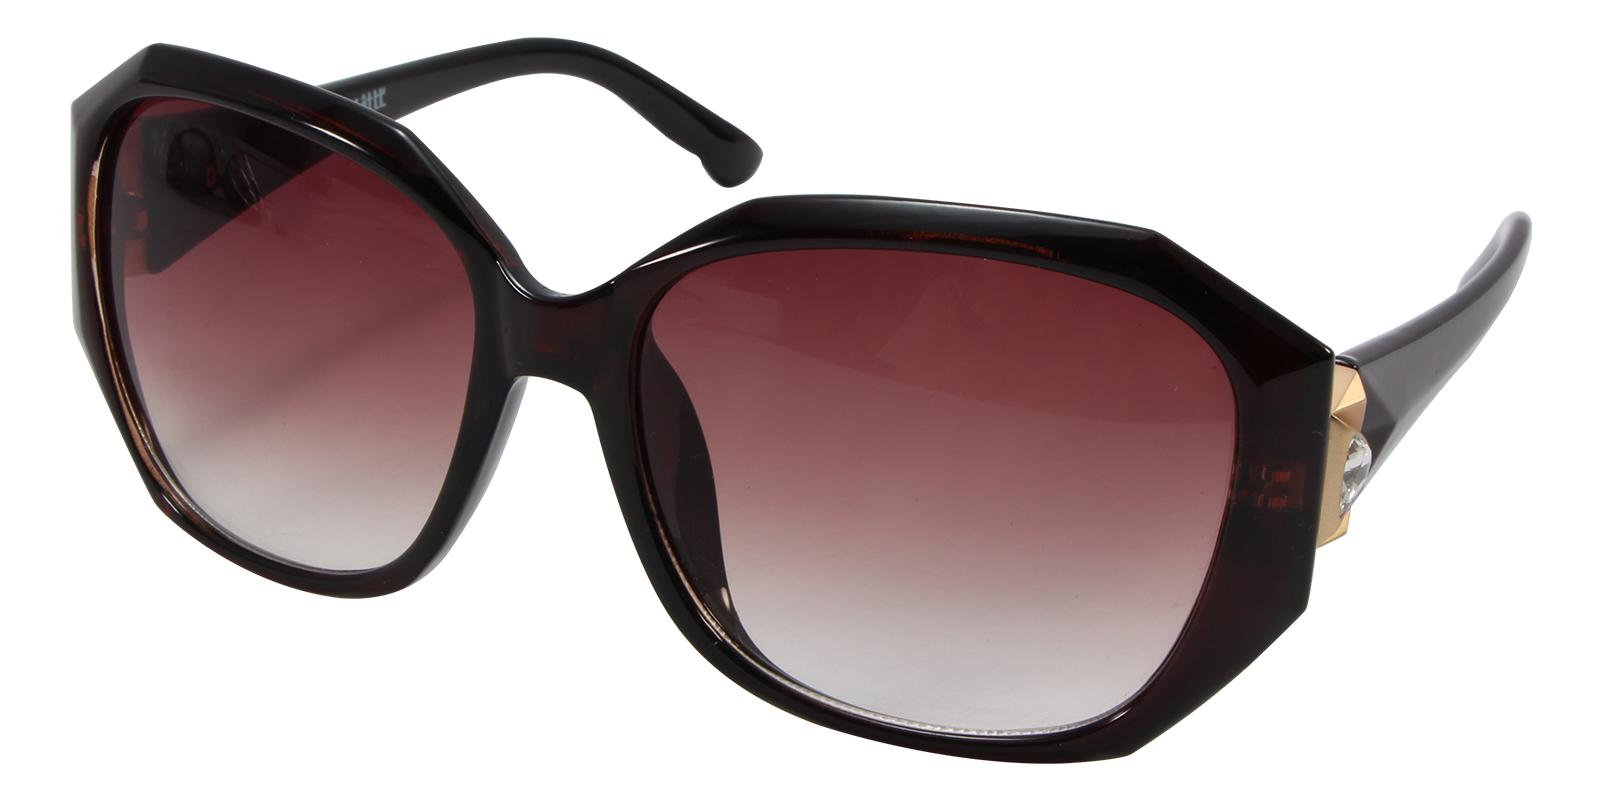 Saturn Brown Acetate Sunglasses , UniversalBridgeFit Frames from ABBE Glasses